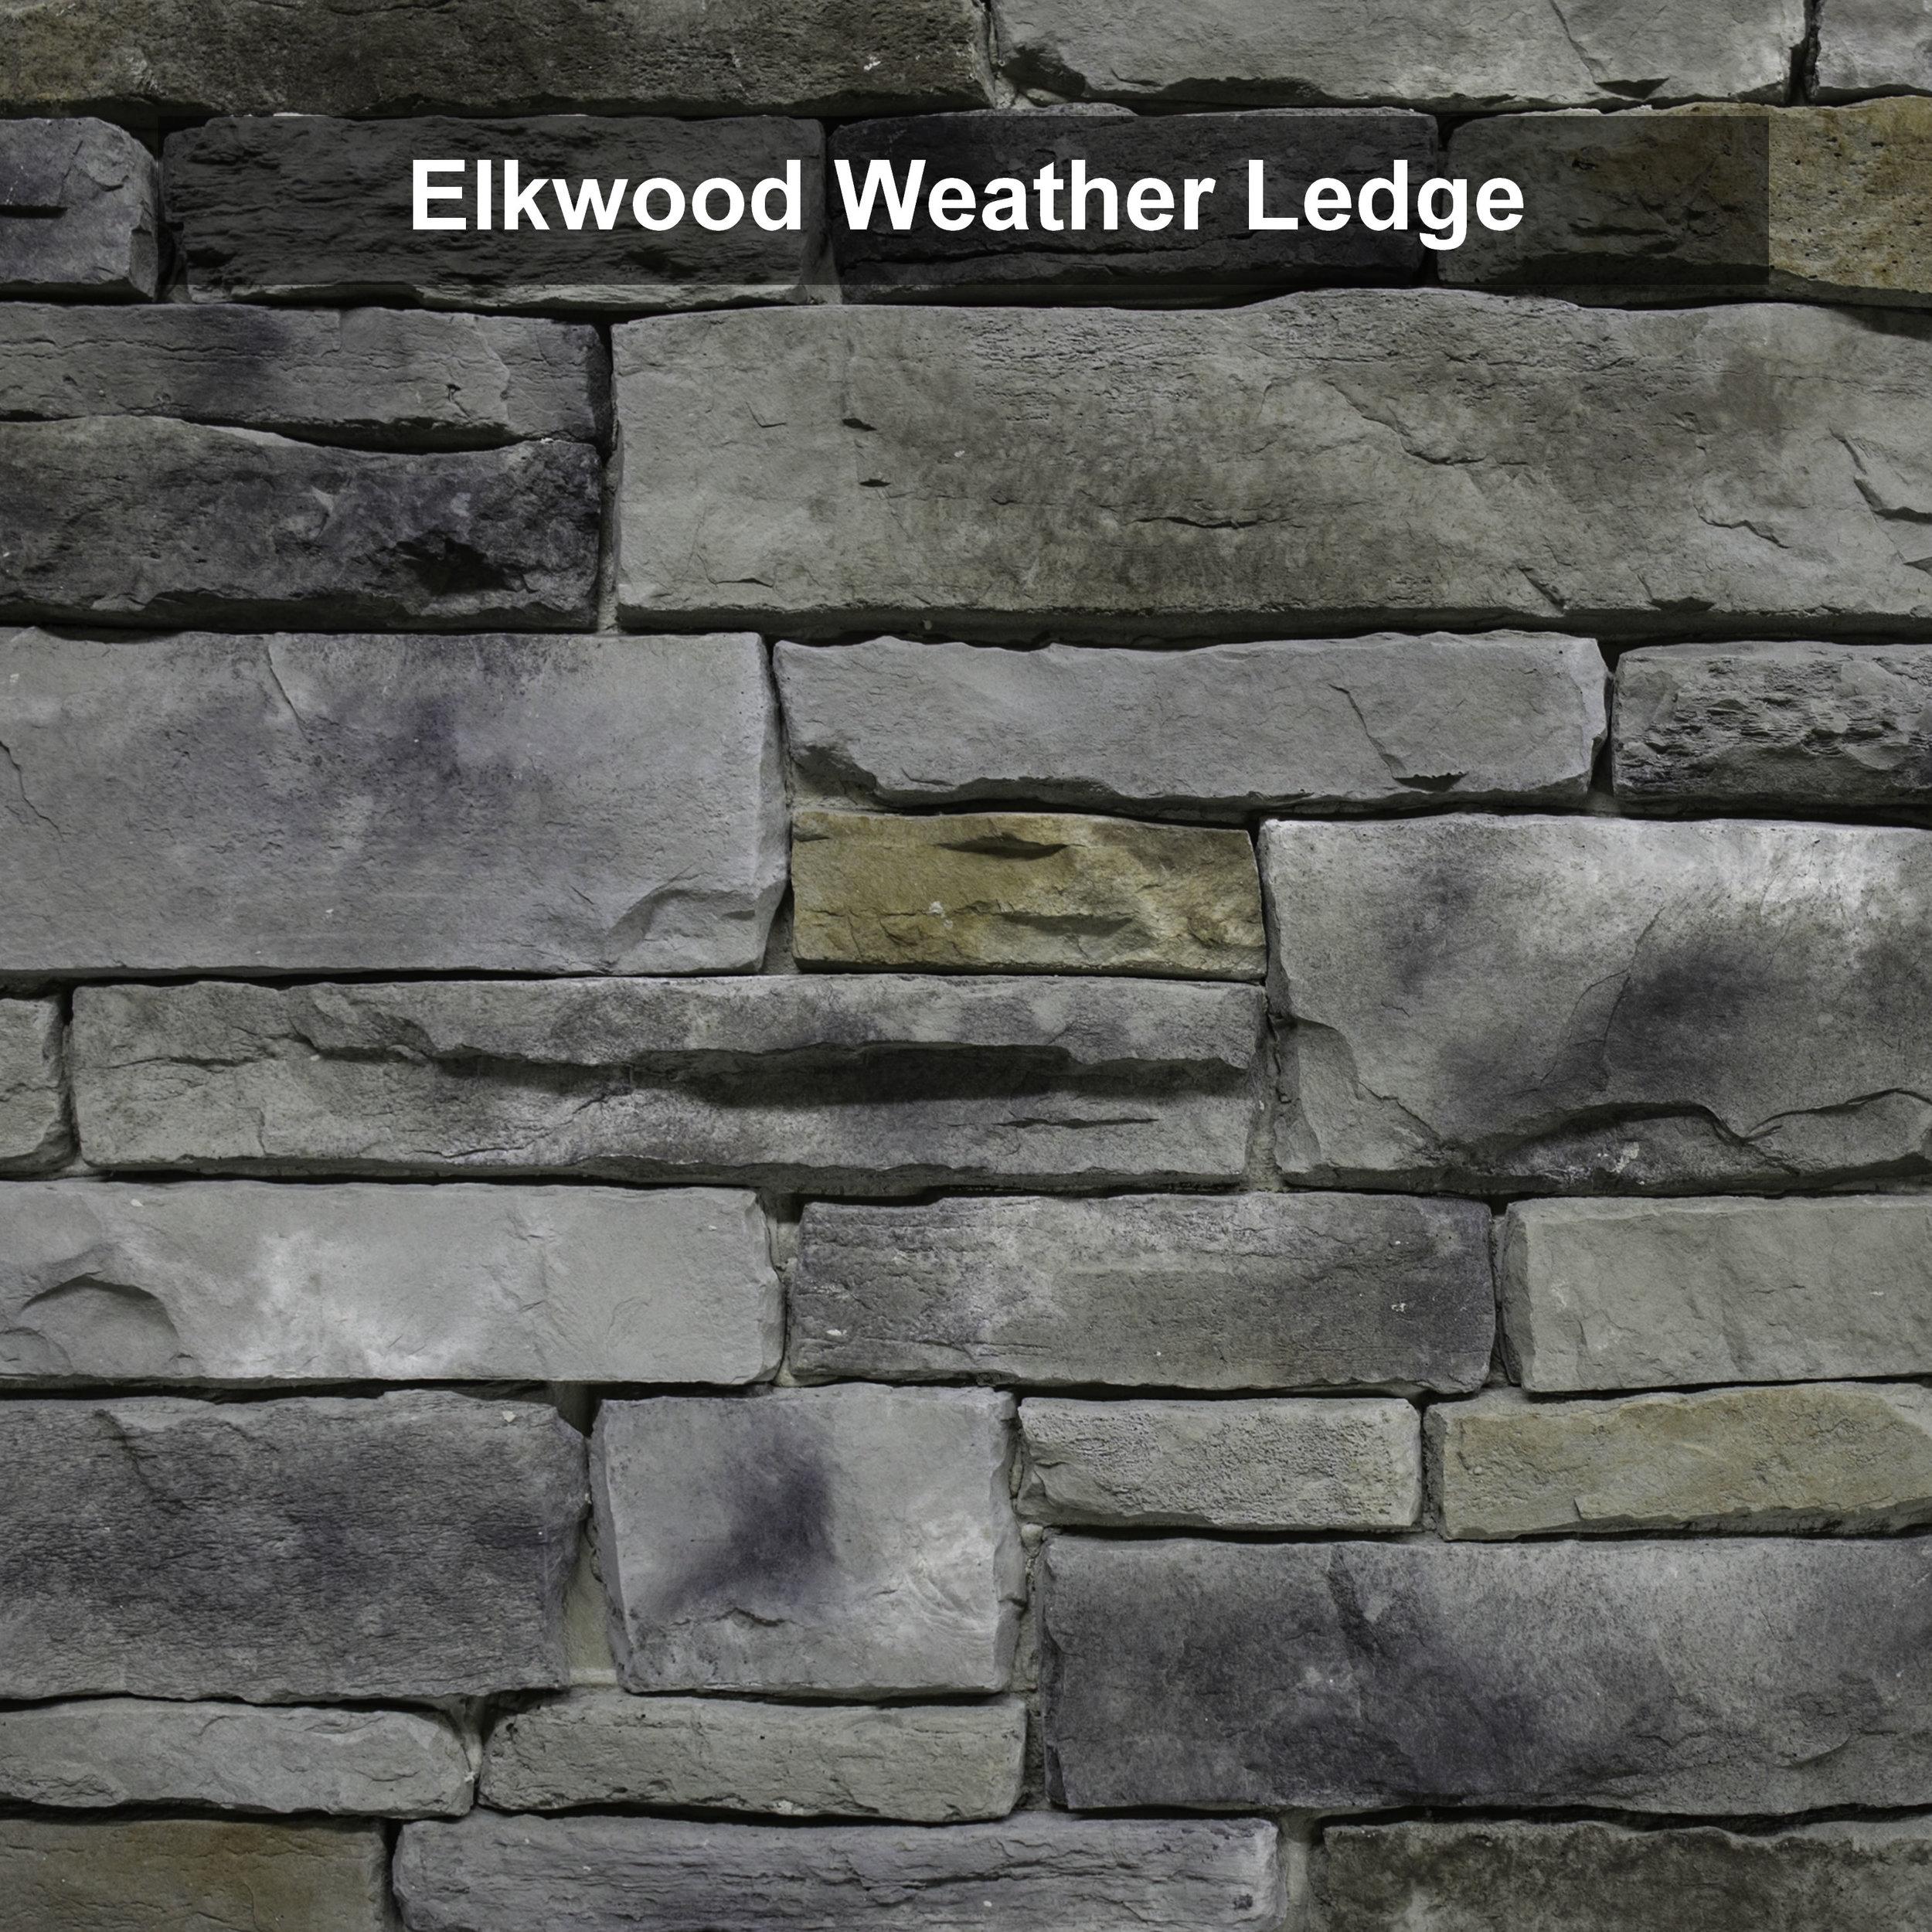 DQ_Weather Ledge_Elkwood_Profile.jpg